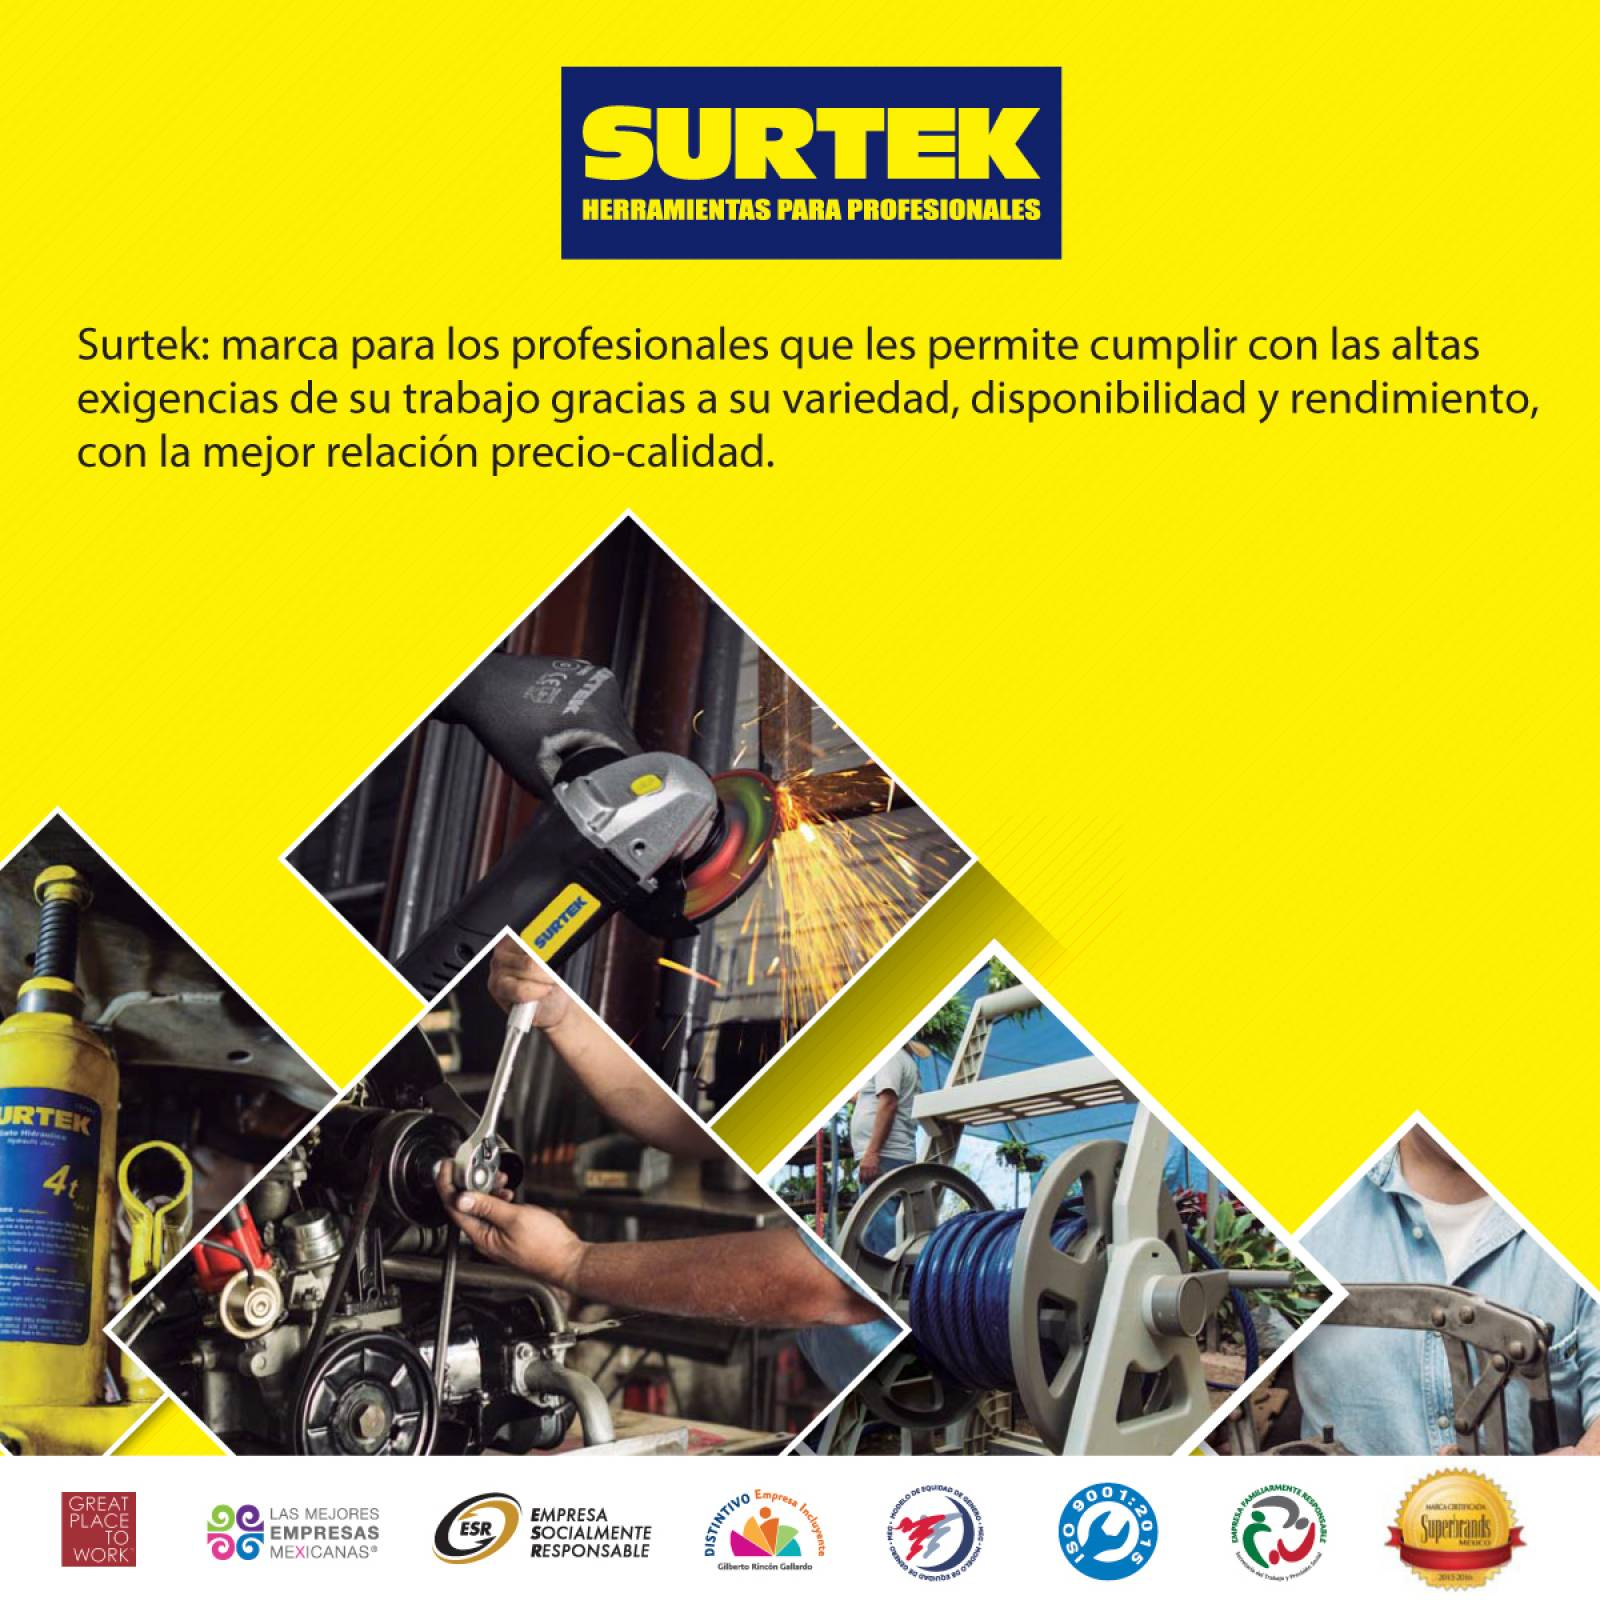 Espuma de poliuretano uso general 500 ml 113521 Surtek